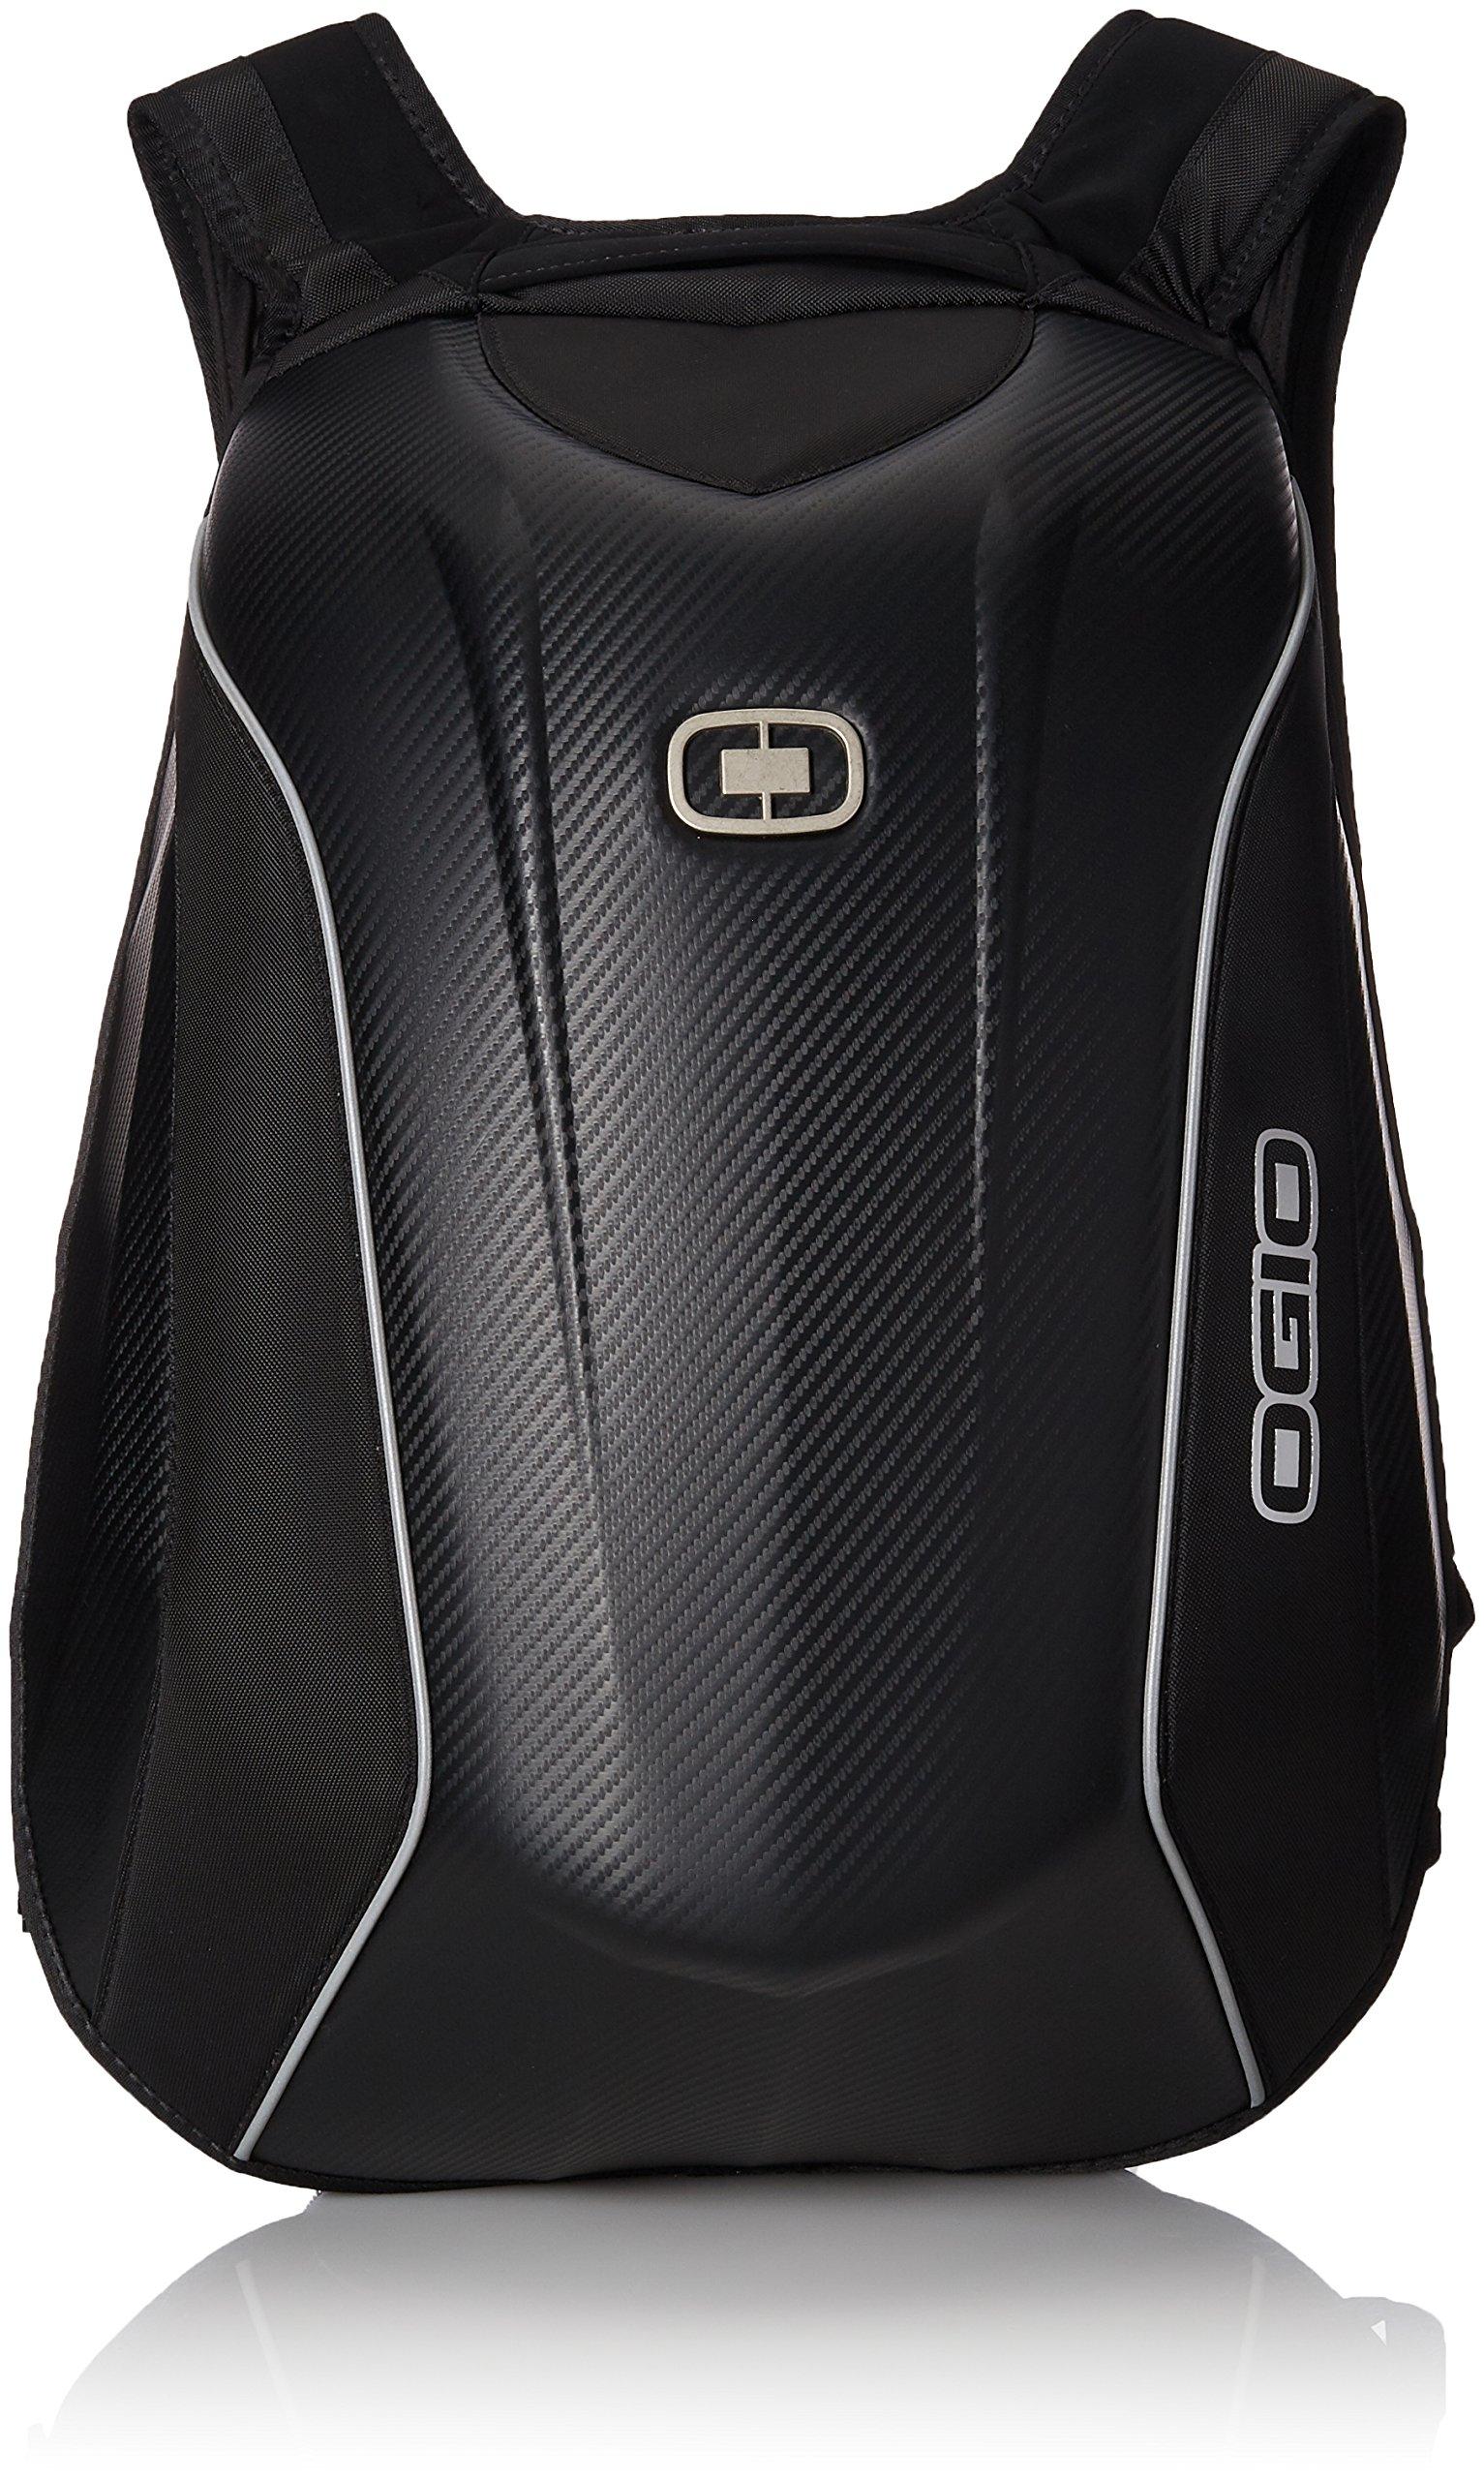 ogio 123006.36 No Drag Mach 5 Motorcycle Backpack - Stealth Black